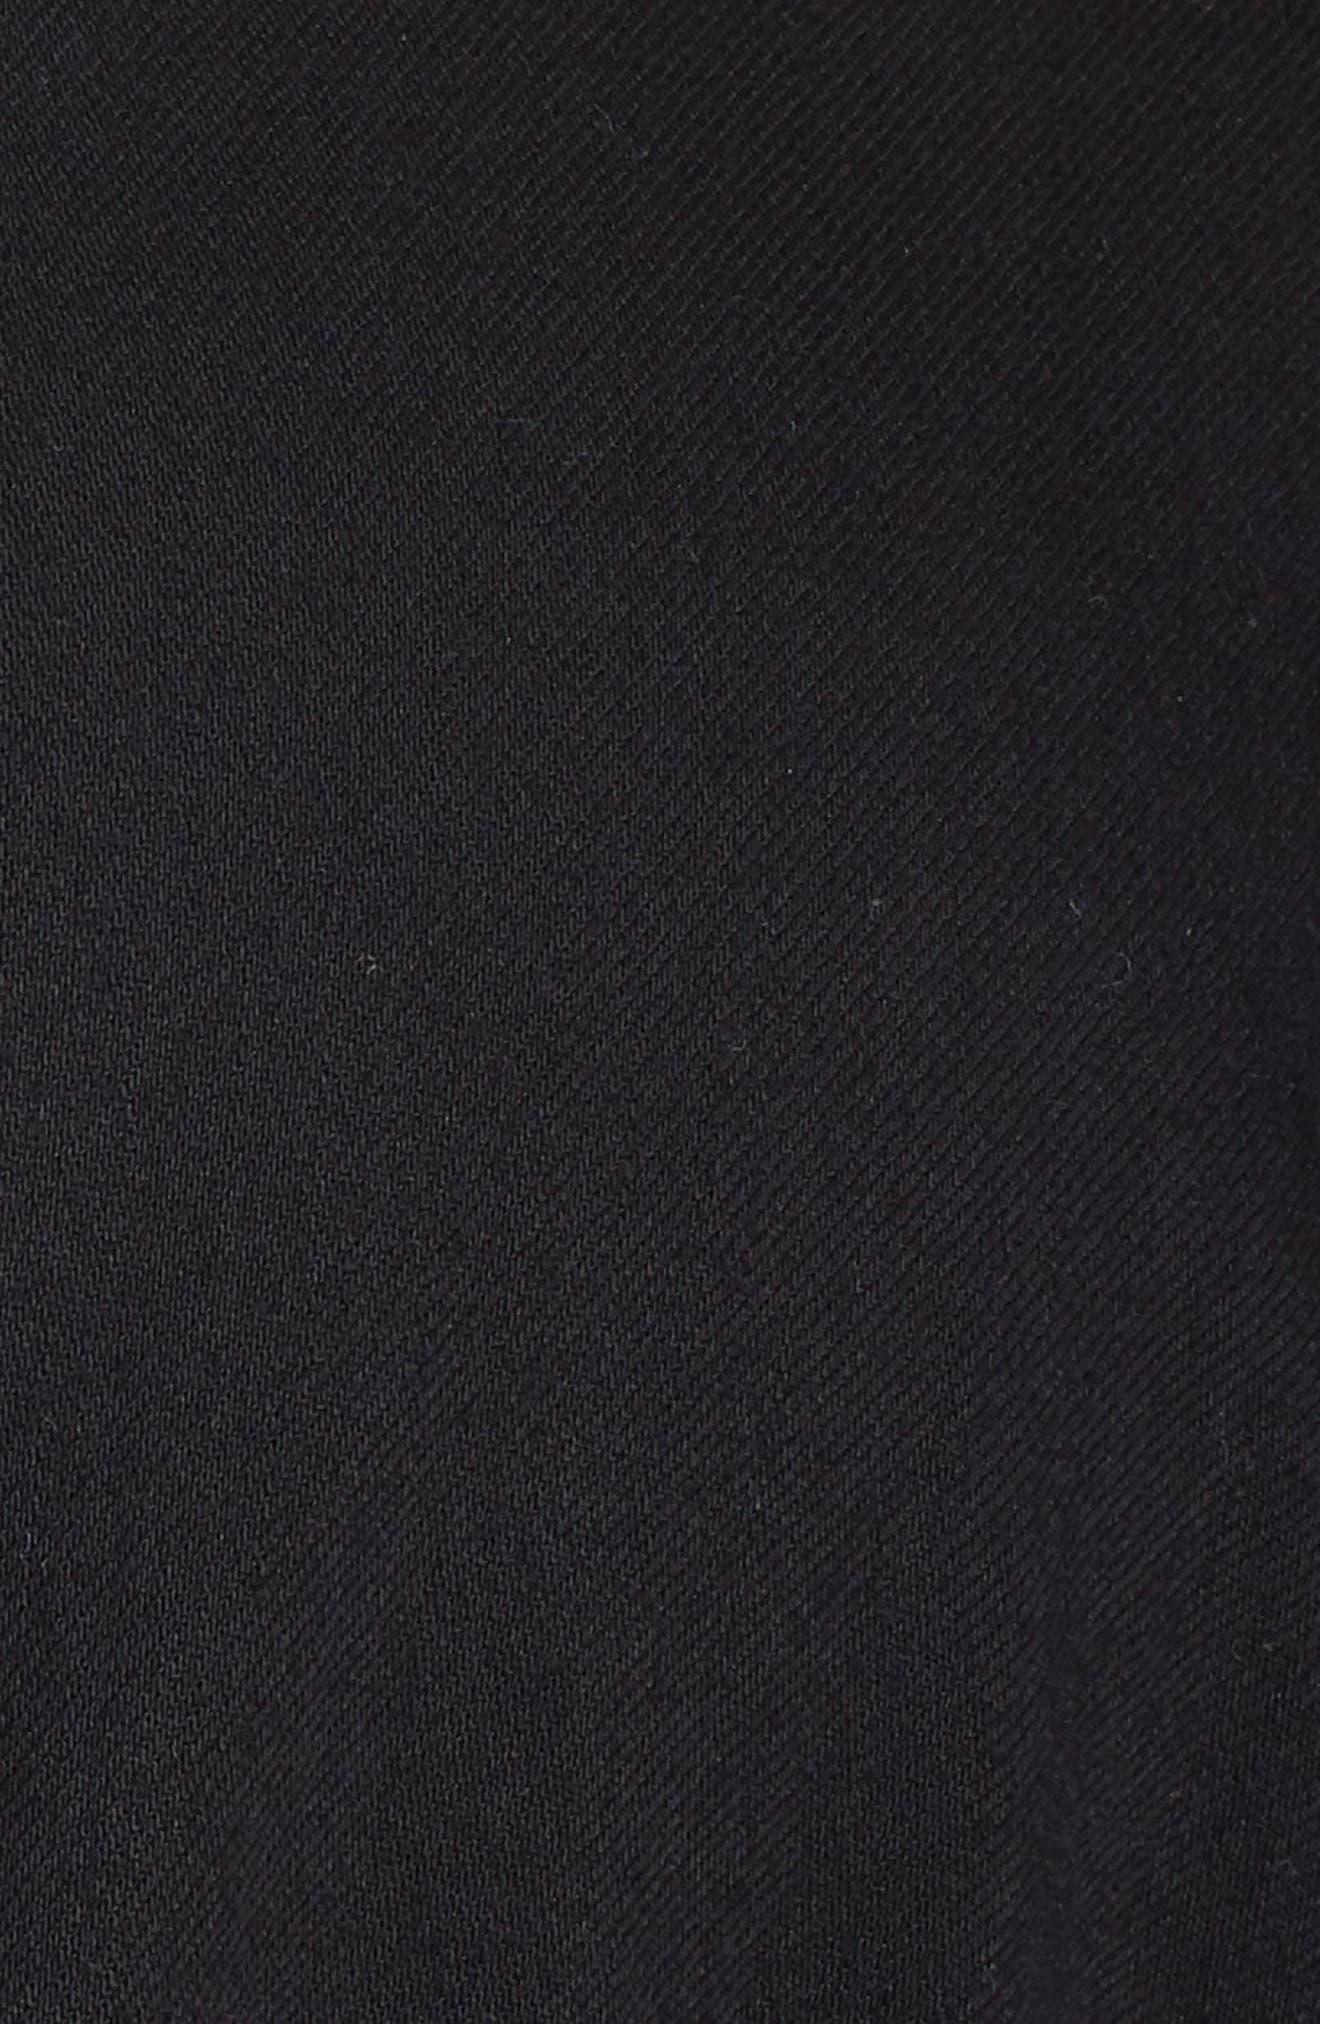 Shirttail Hem Organic Cotton Jacket,                             Alternate thumbnail 7, color,                             001